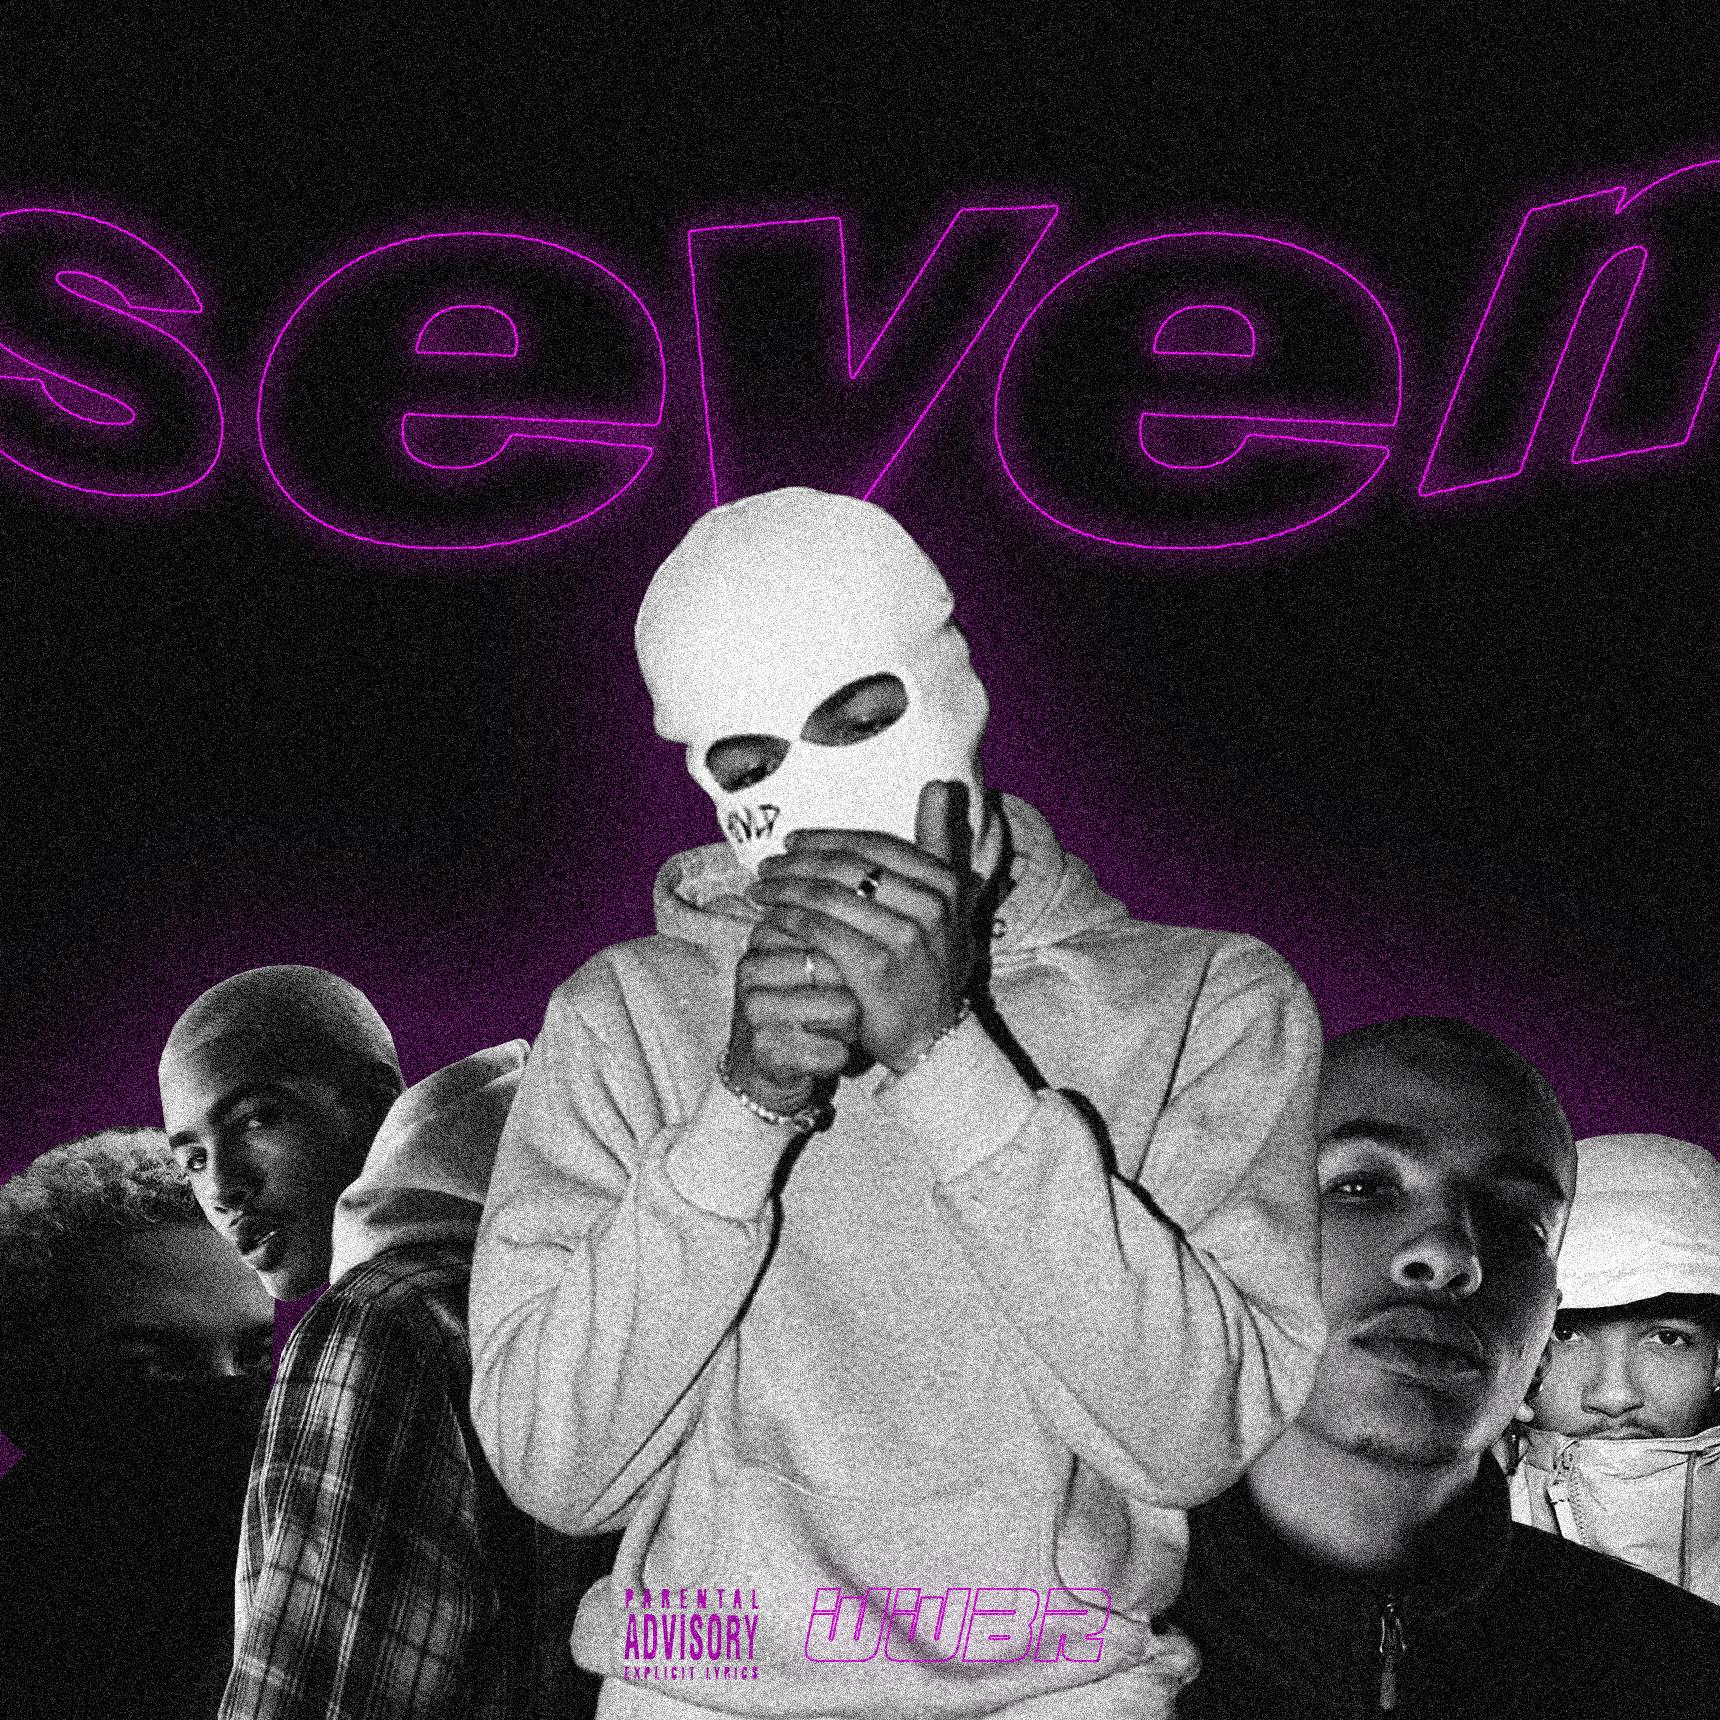 LOWSSA - SEVEN (album cover)